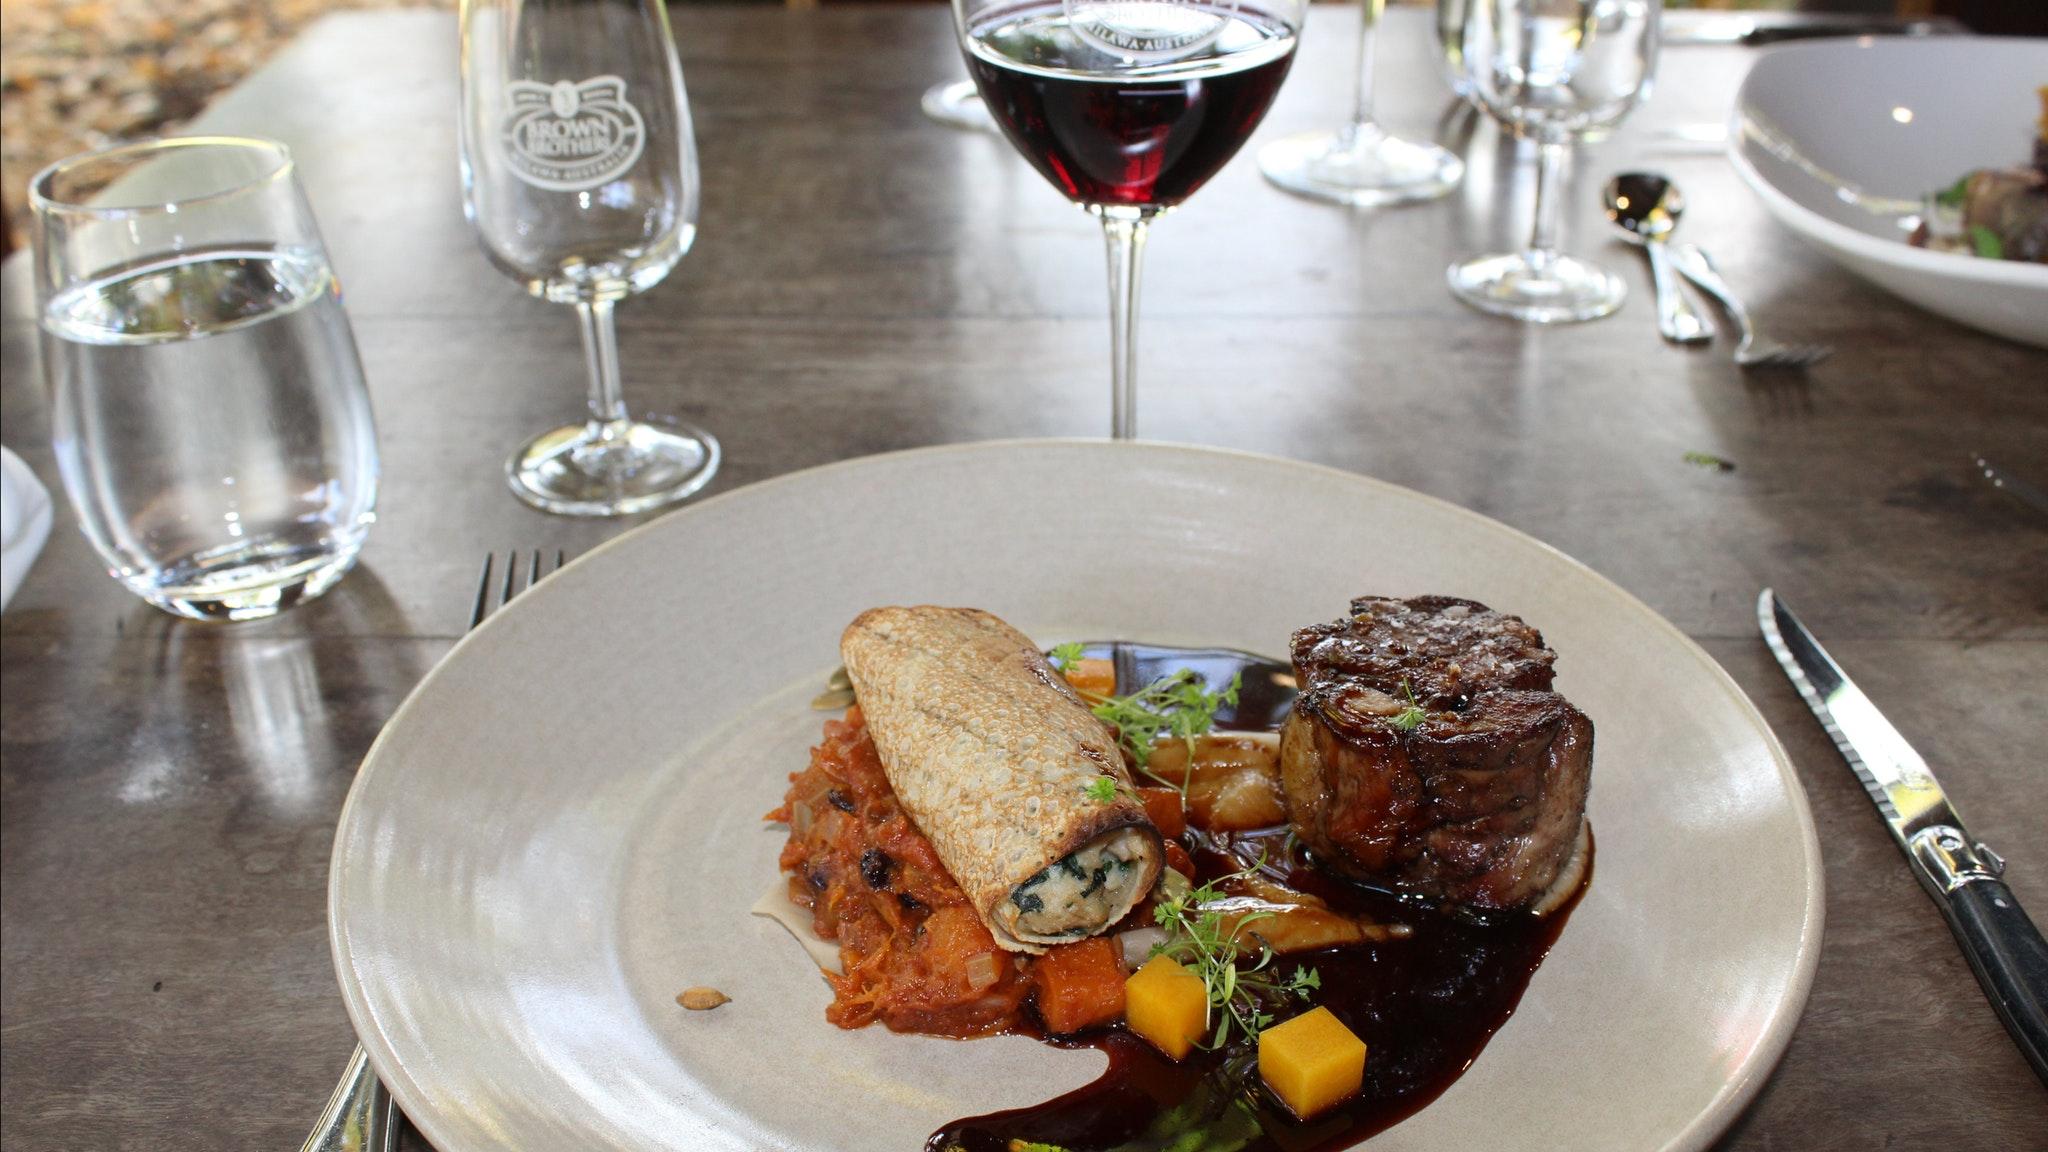 Luxury Limo, Gourmet Food & Wine Experience